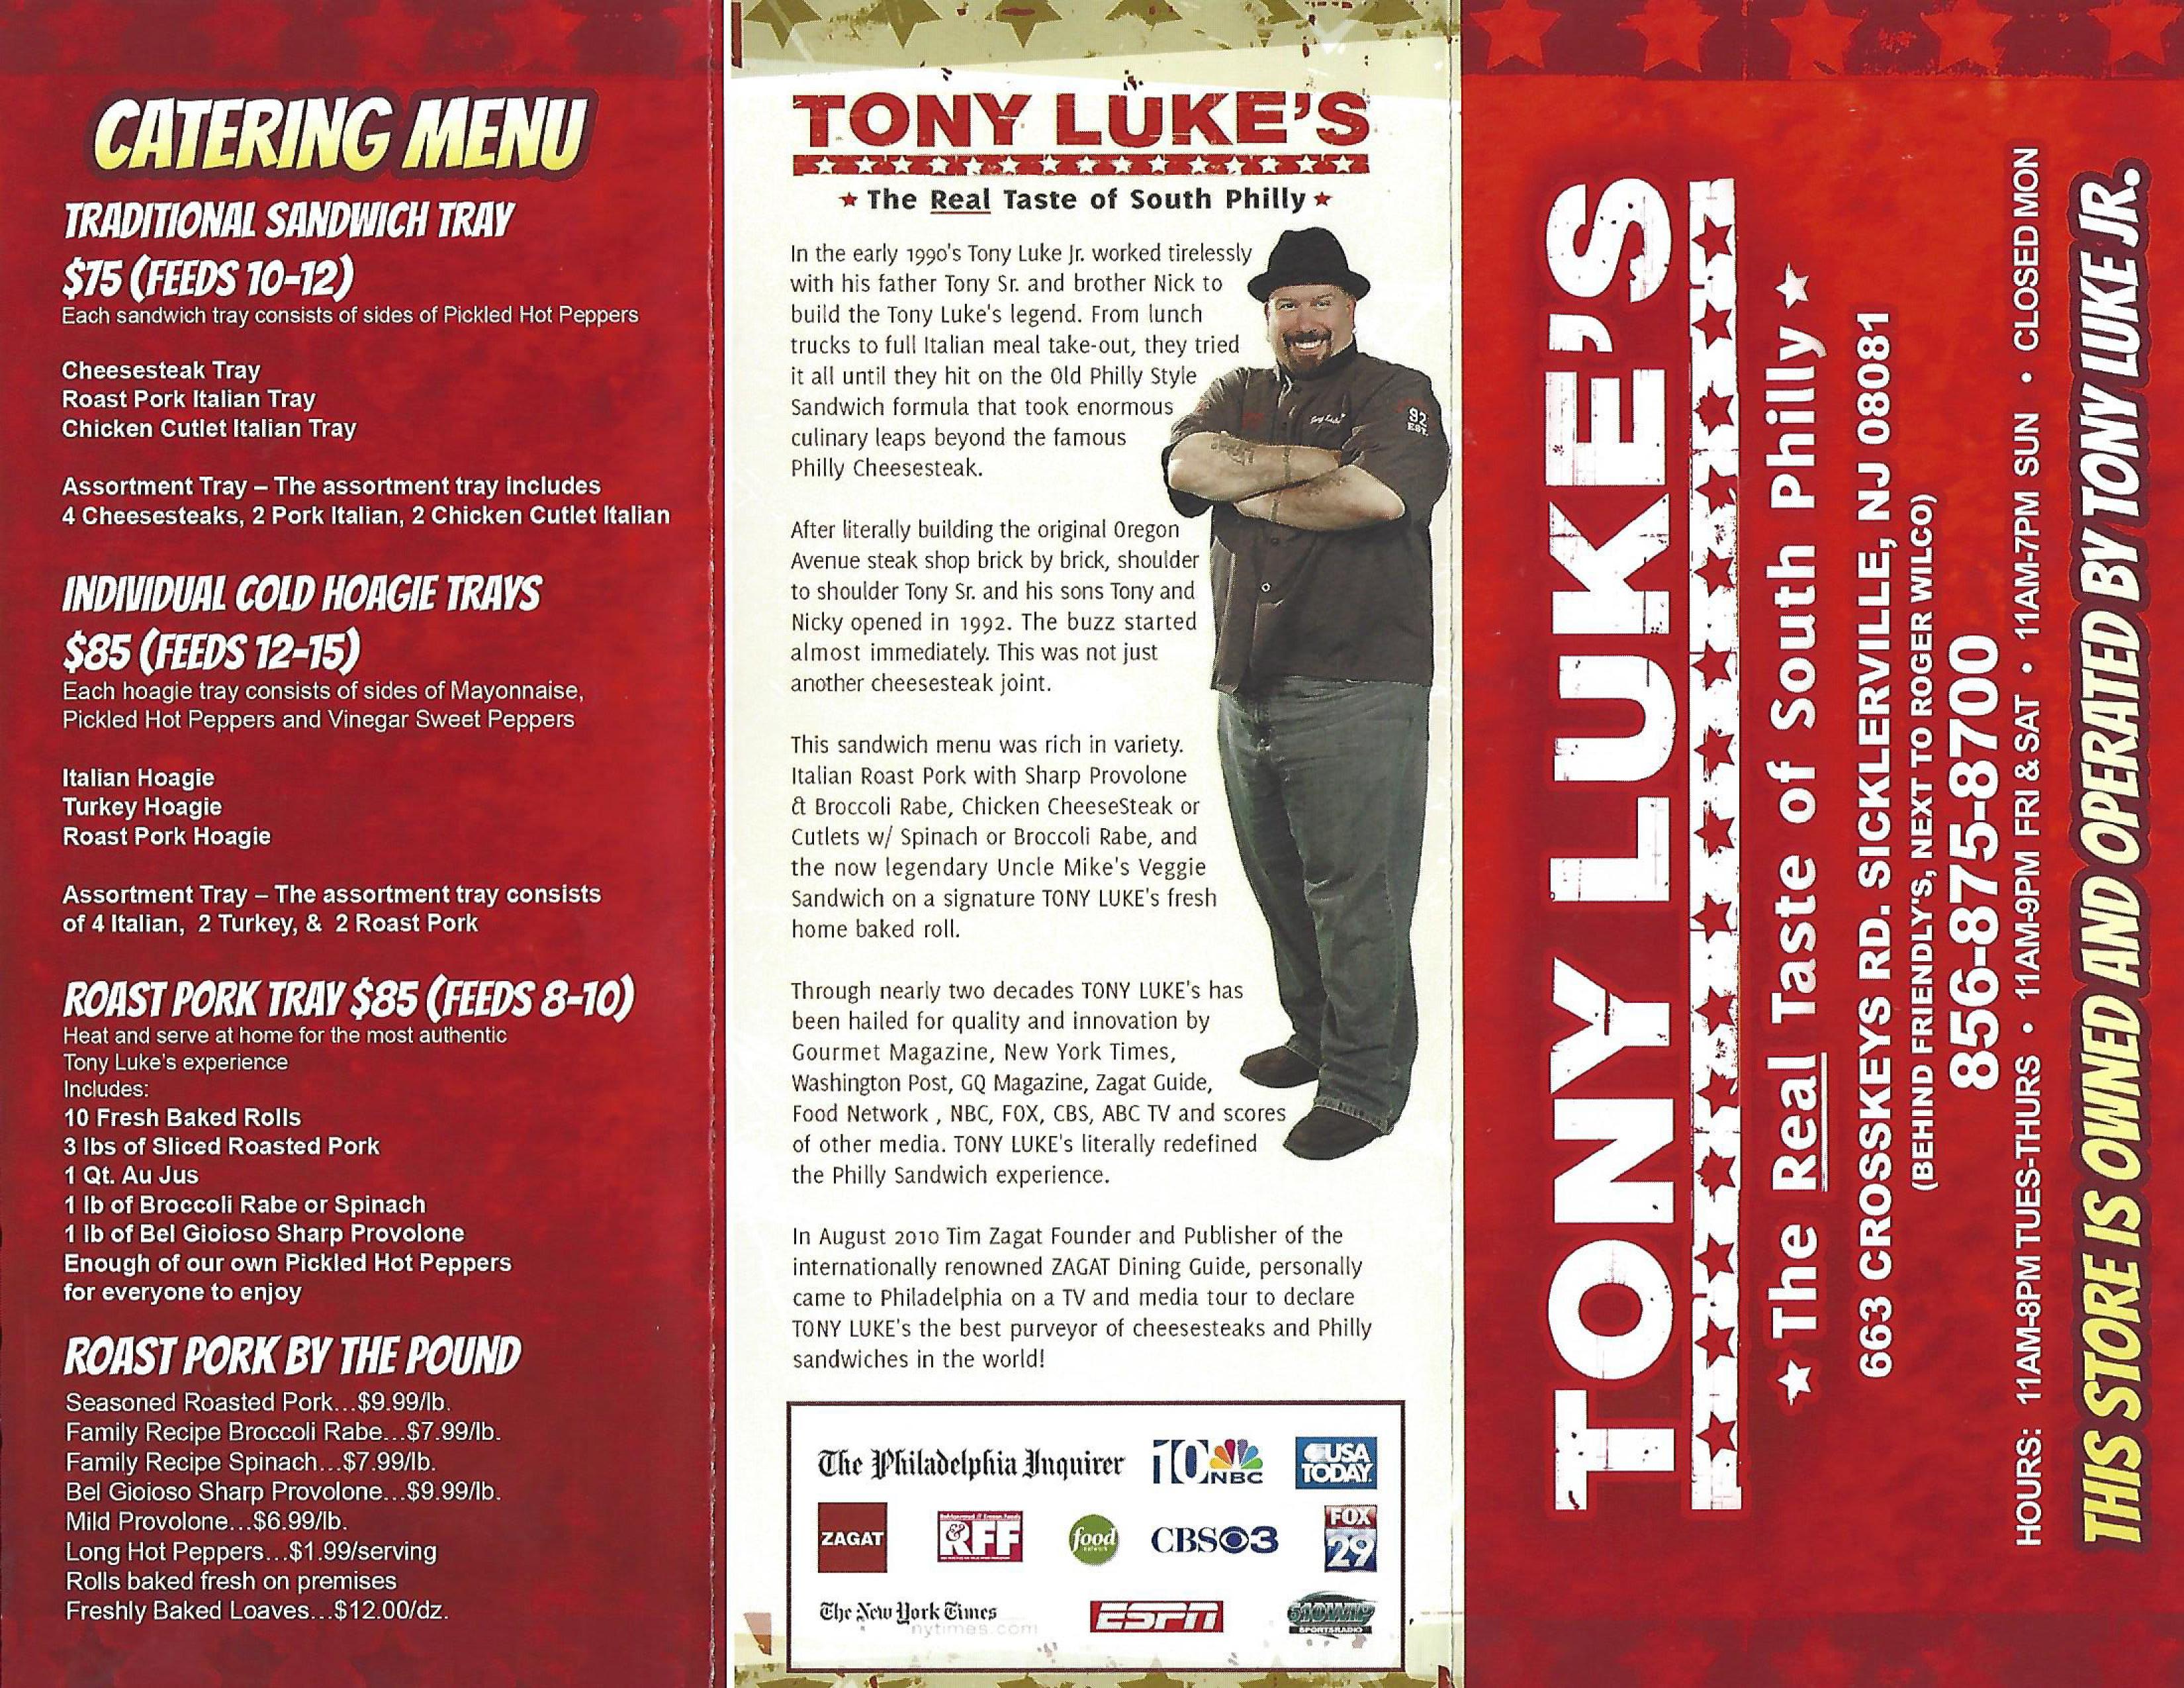 Tony Luke's Sicklerville